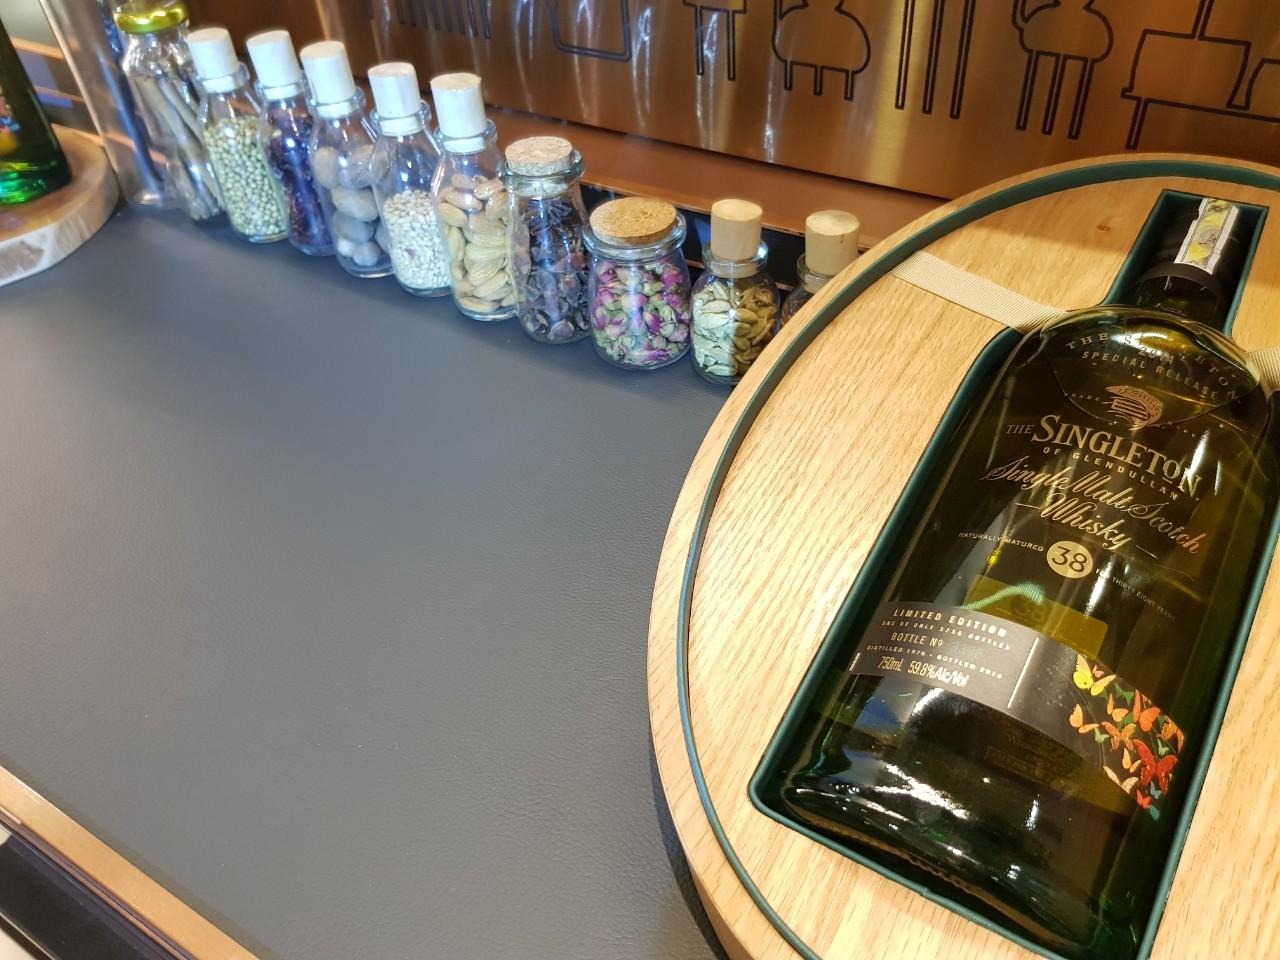 Singleton 38 - rượu Singleton 38 Glendullan - Sành rượu: Wine & Spirits